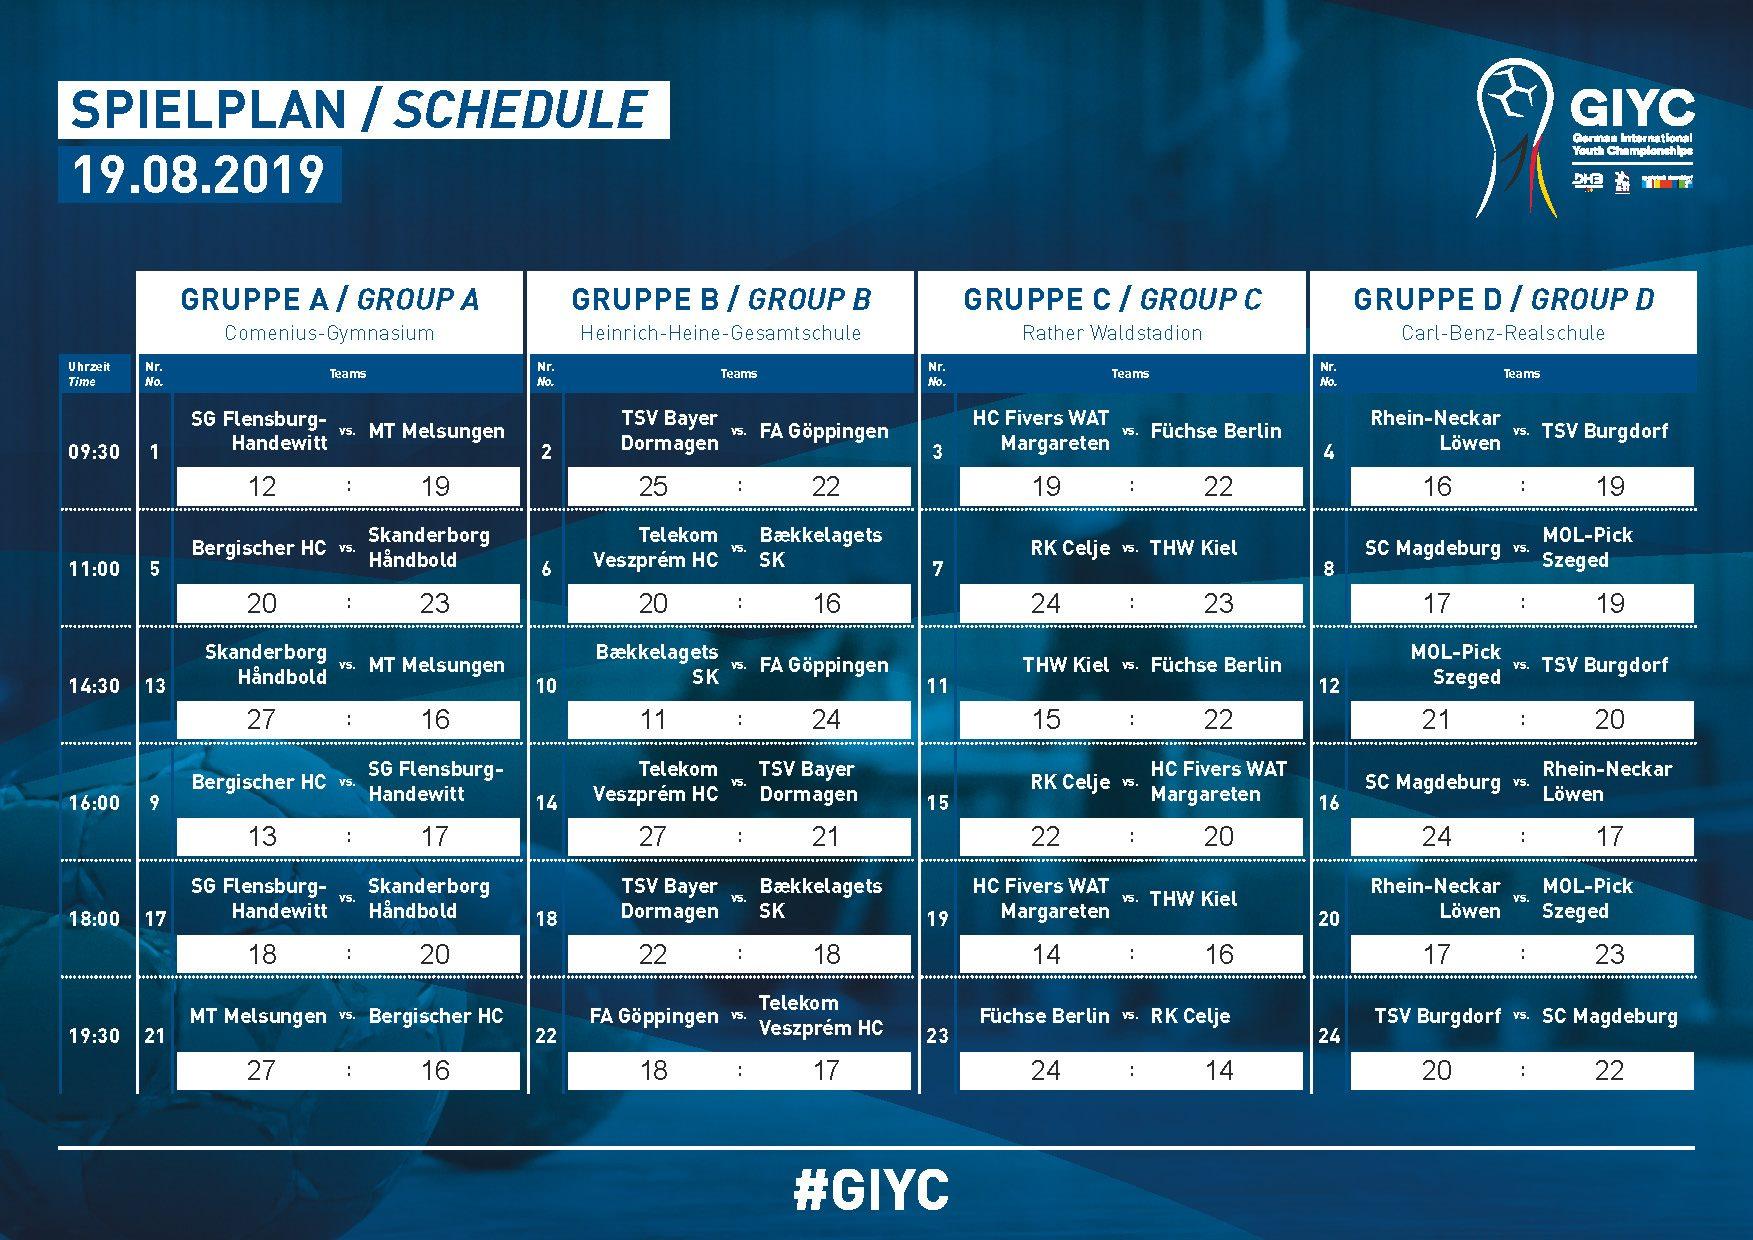 GIYC_2019_Spielplan_1